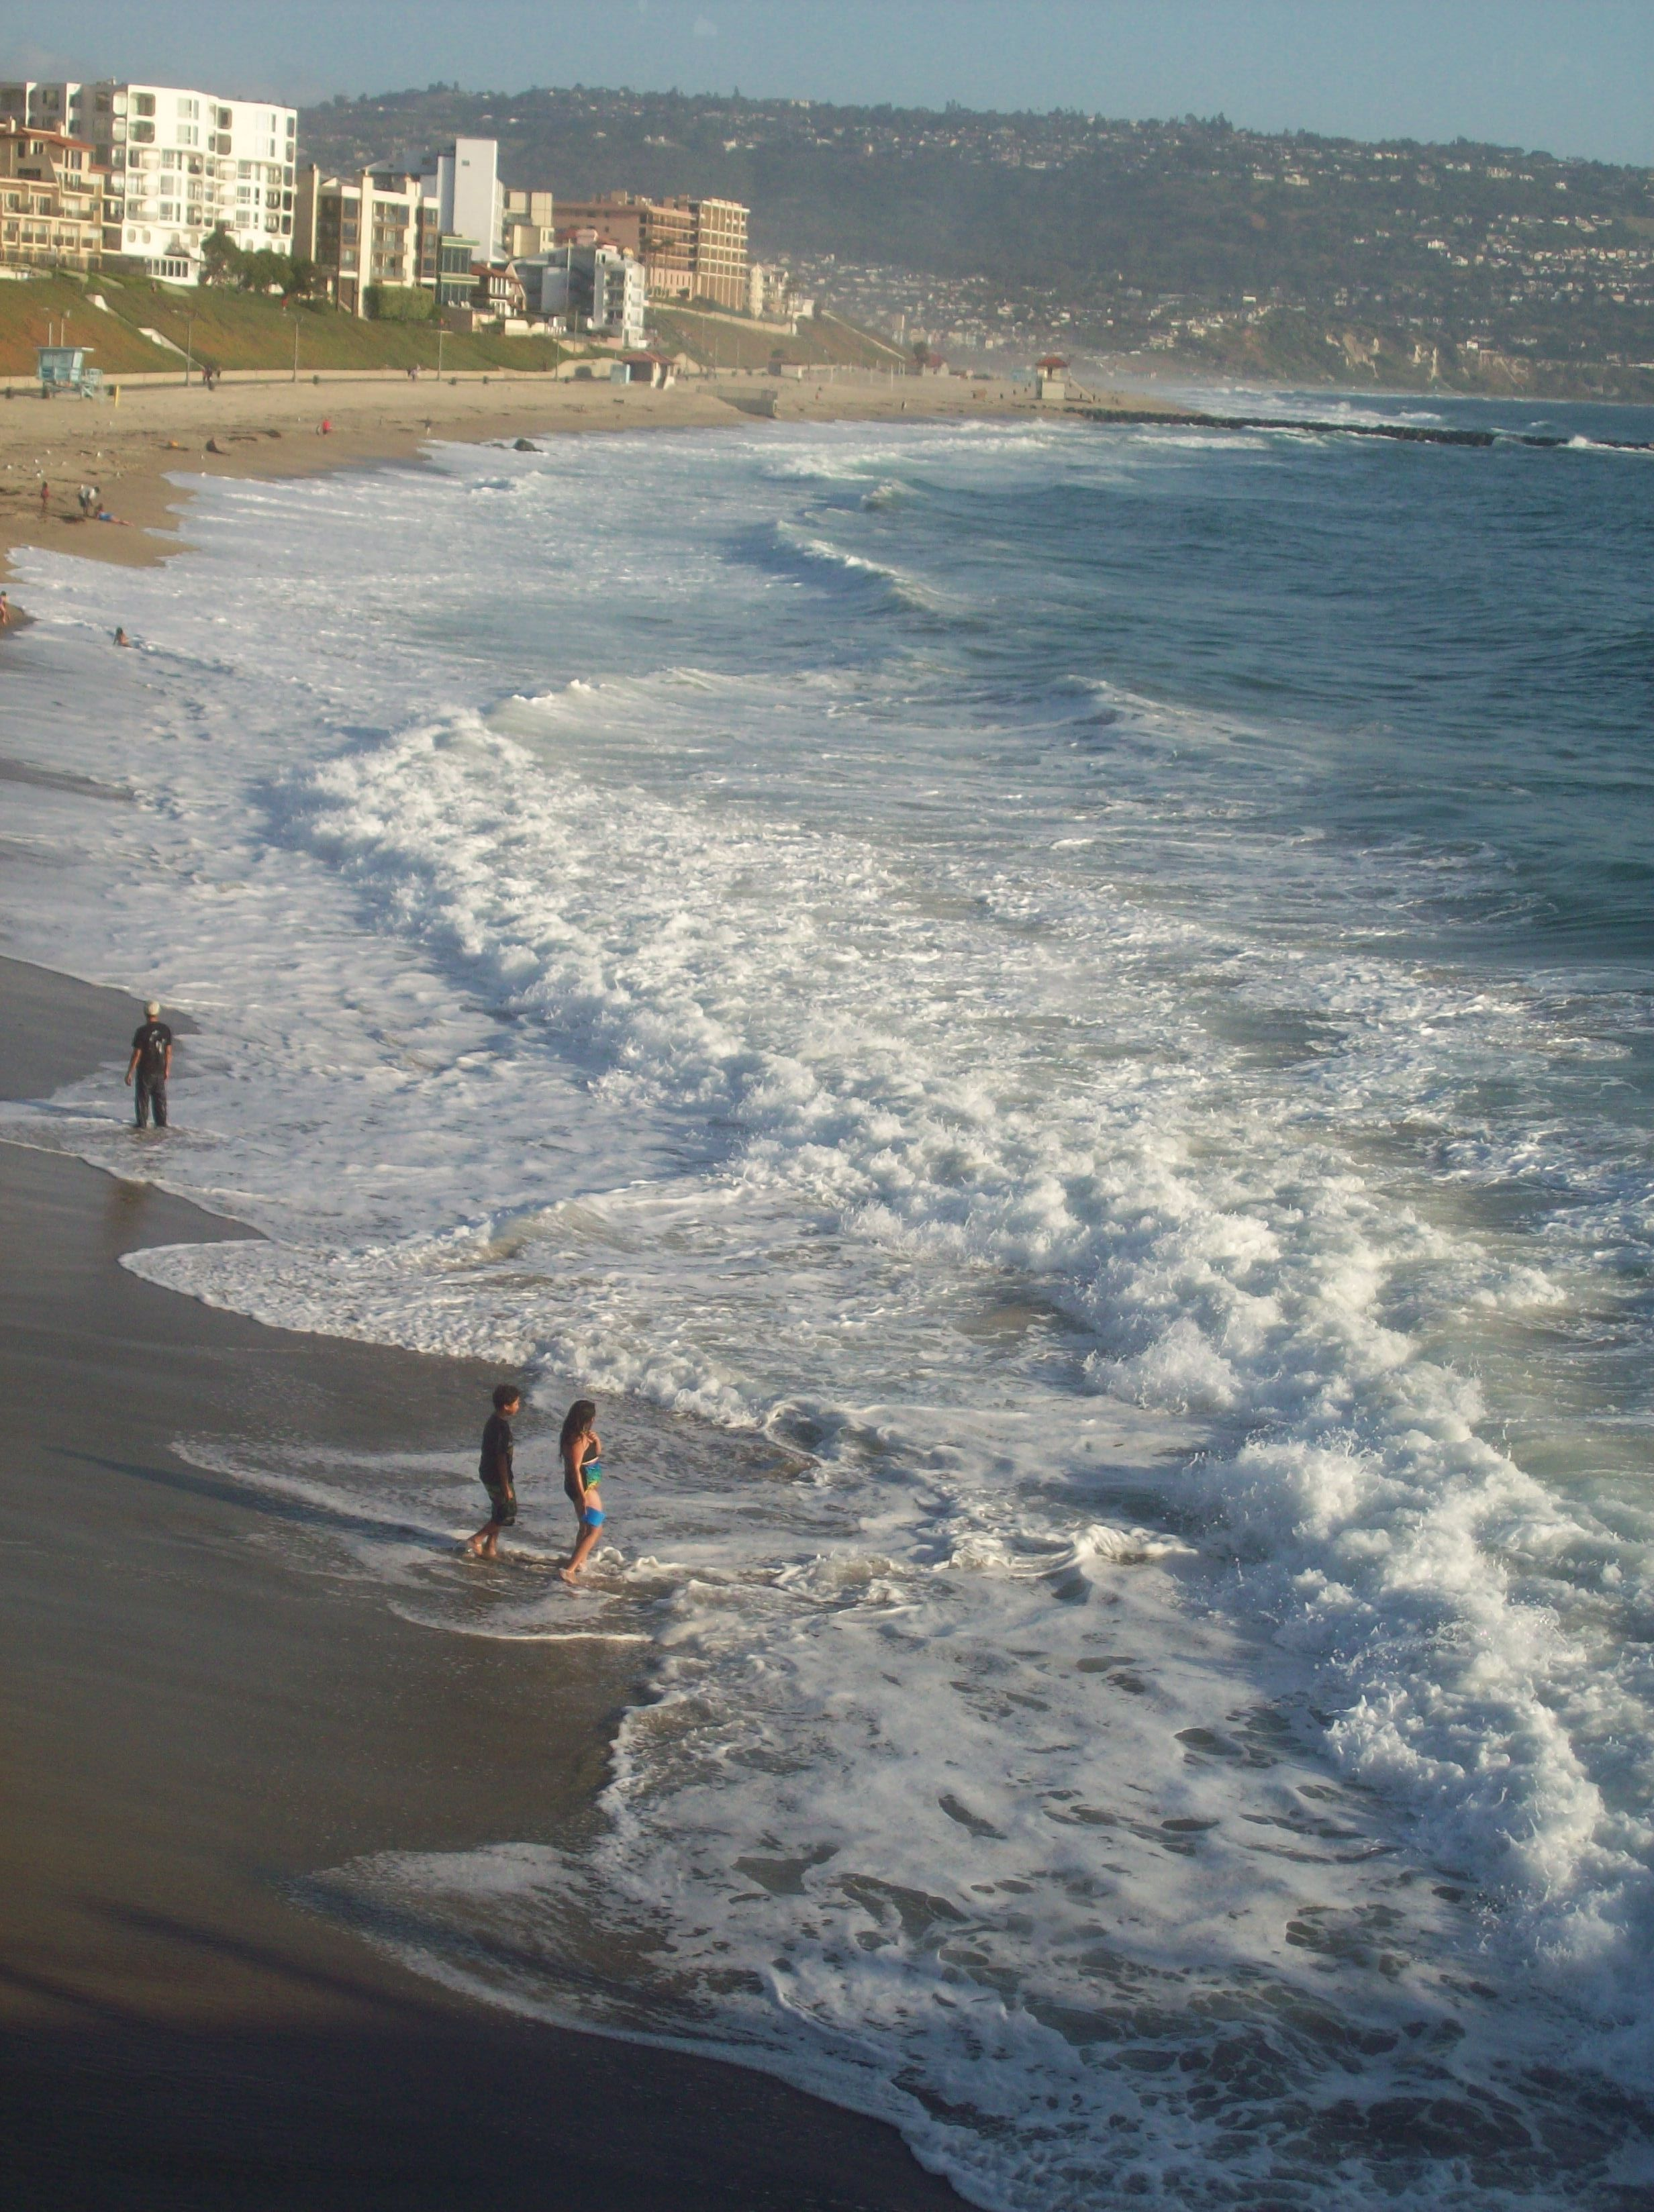 Redondo Beach canu0027t believe I used to